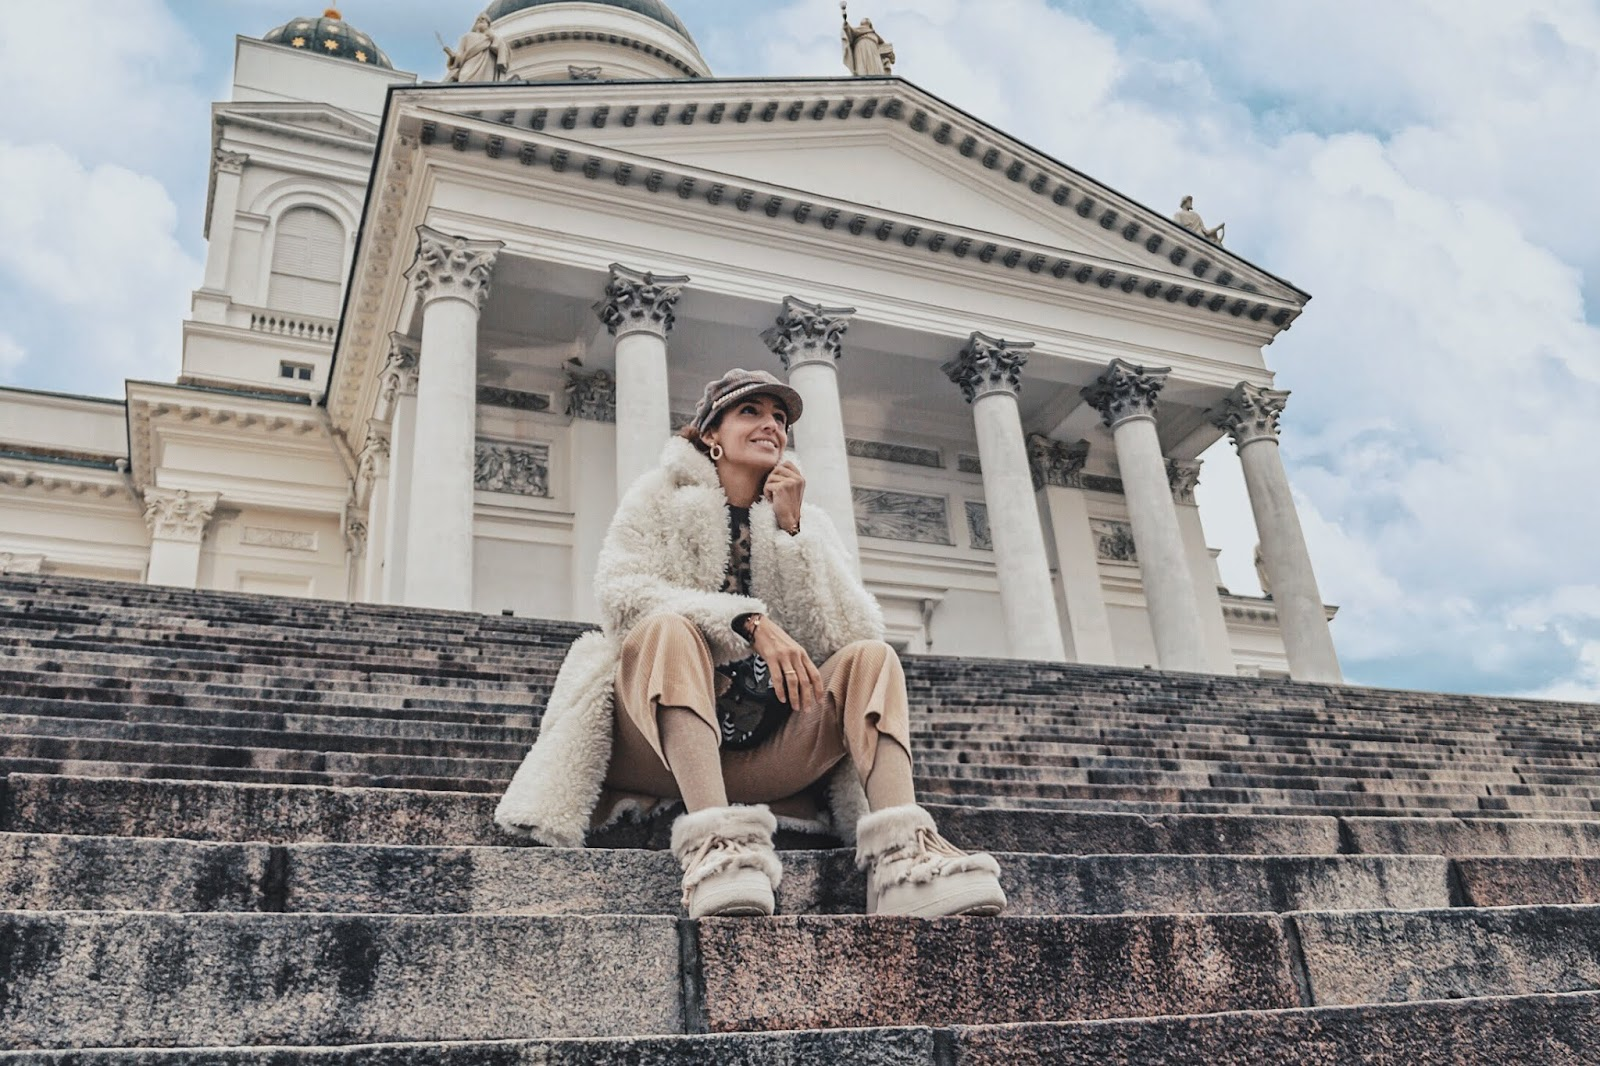 el-blog-de-silvia-rodriguez-lifestyle-travel-finlandia-my-helsinki-pantalones-pana-jersey-leopardo-hm-inuikii-blogger-influencer